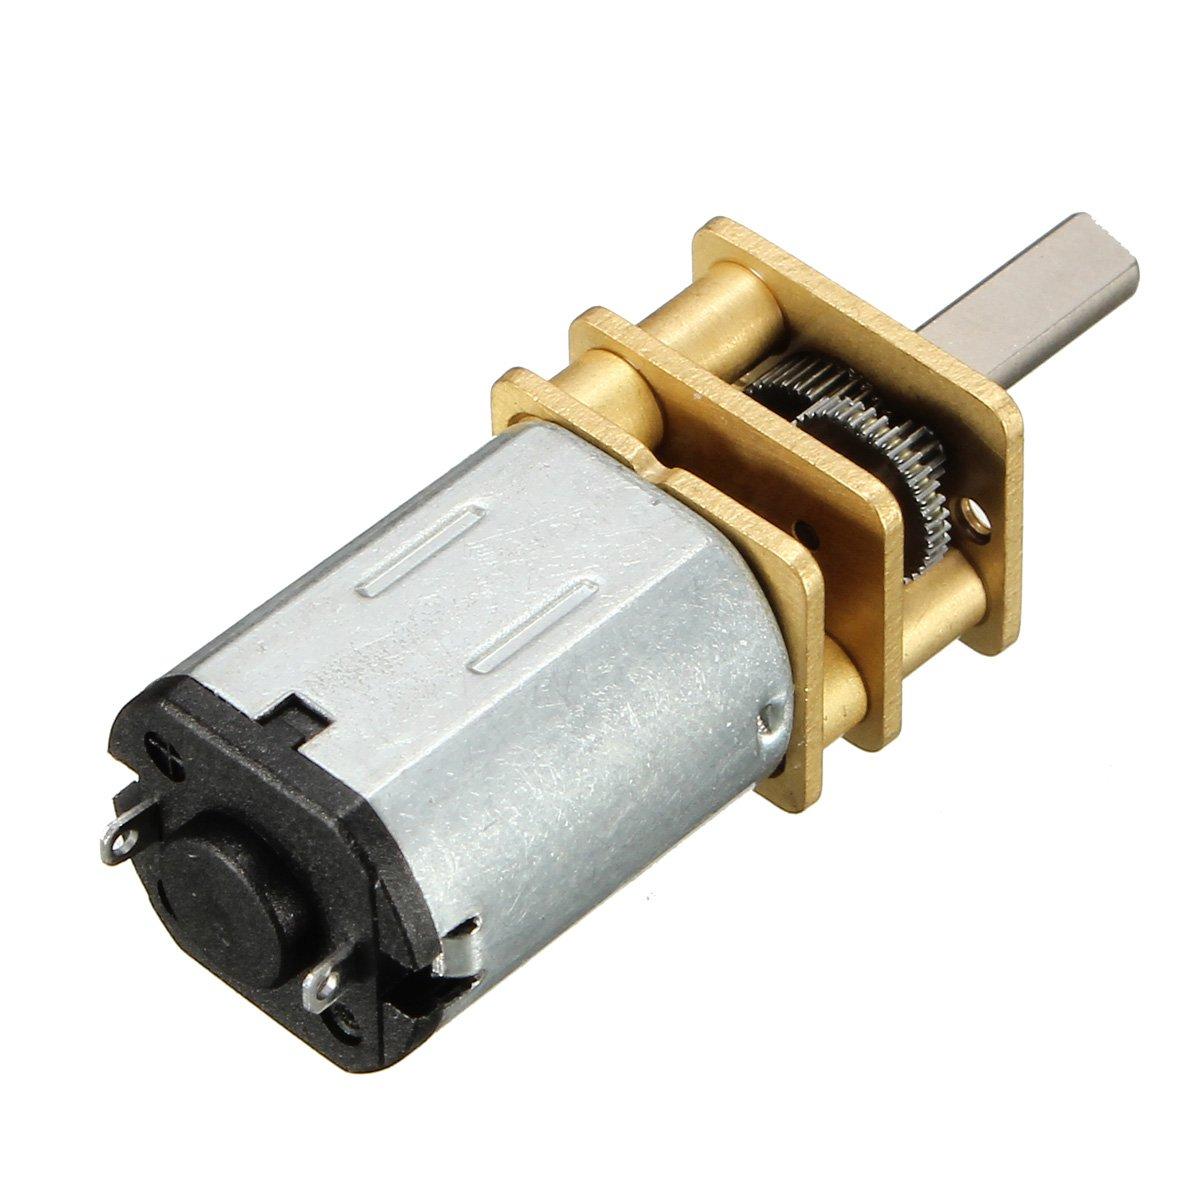 N20-3V-500 Rpm Micro Metal Gear-box DC Motor